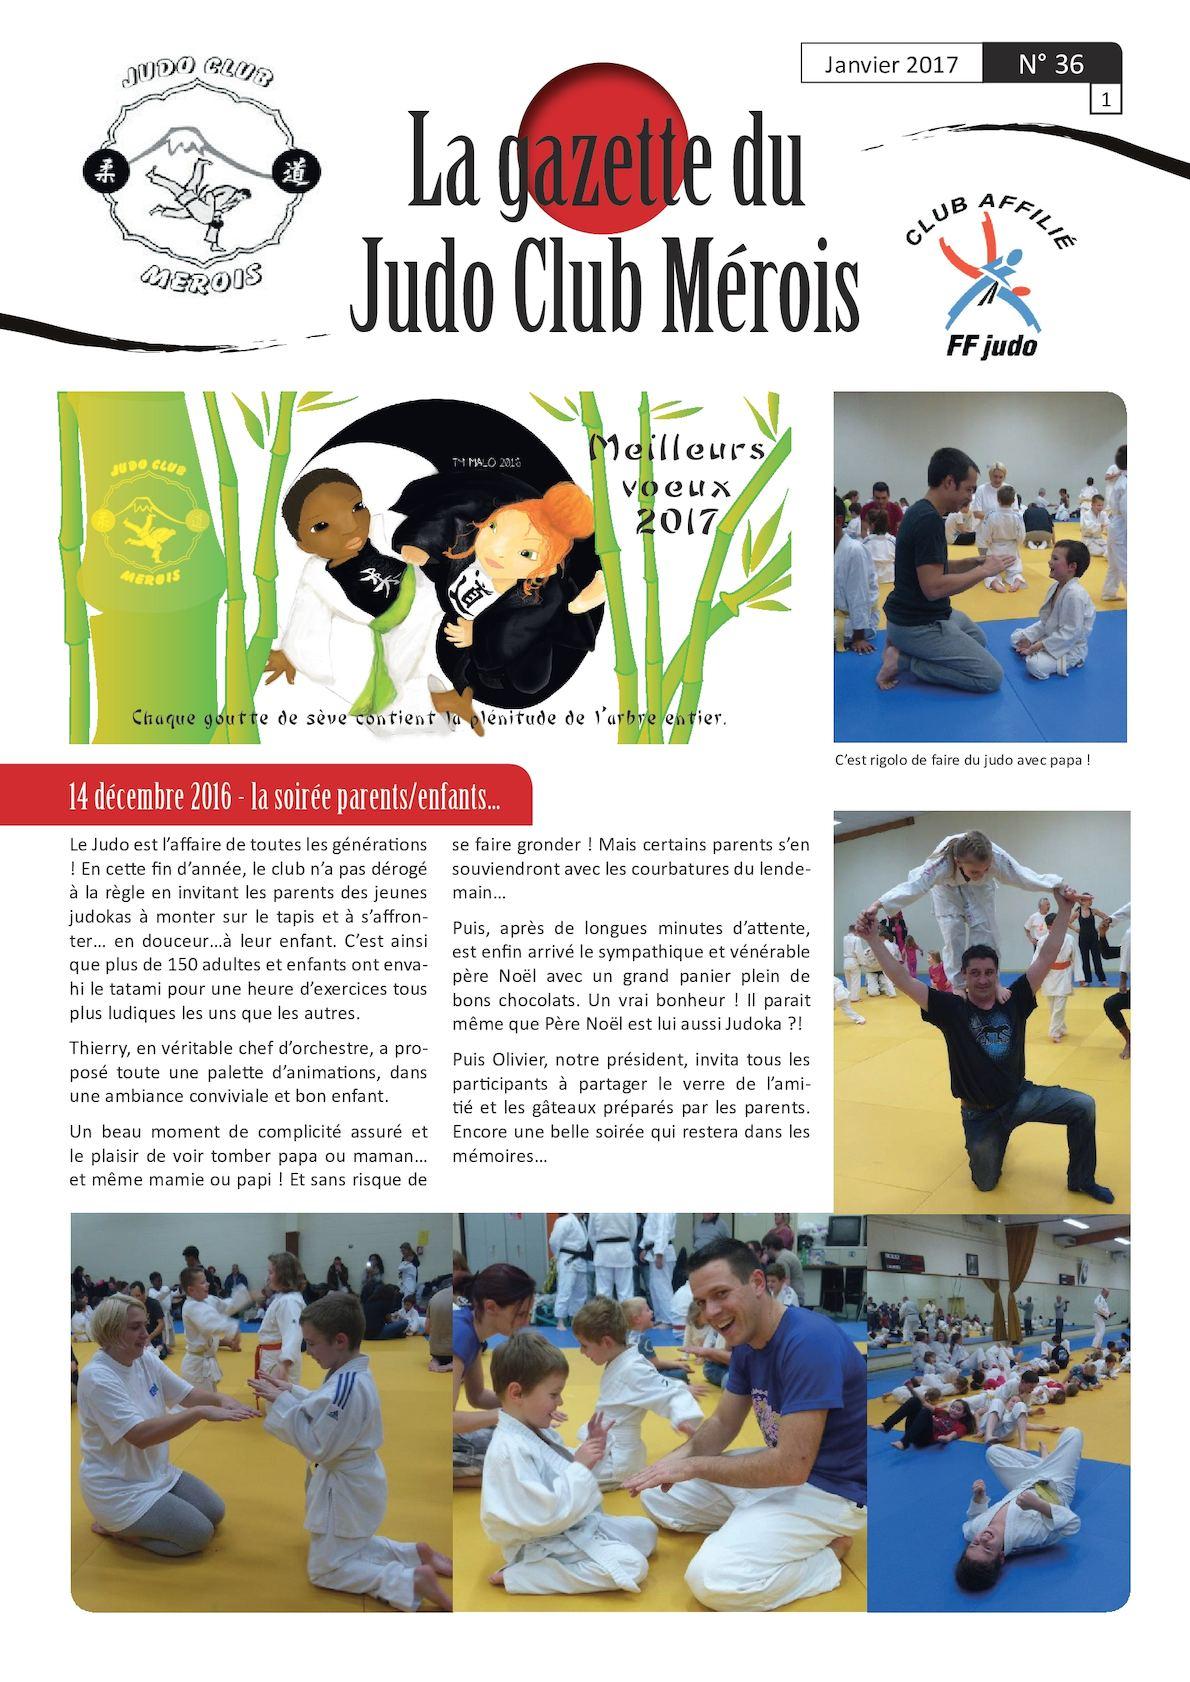 Calaméo - Gazette Judo Club Merois Janvier 2017 06b56670a06